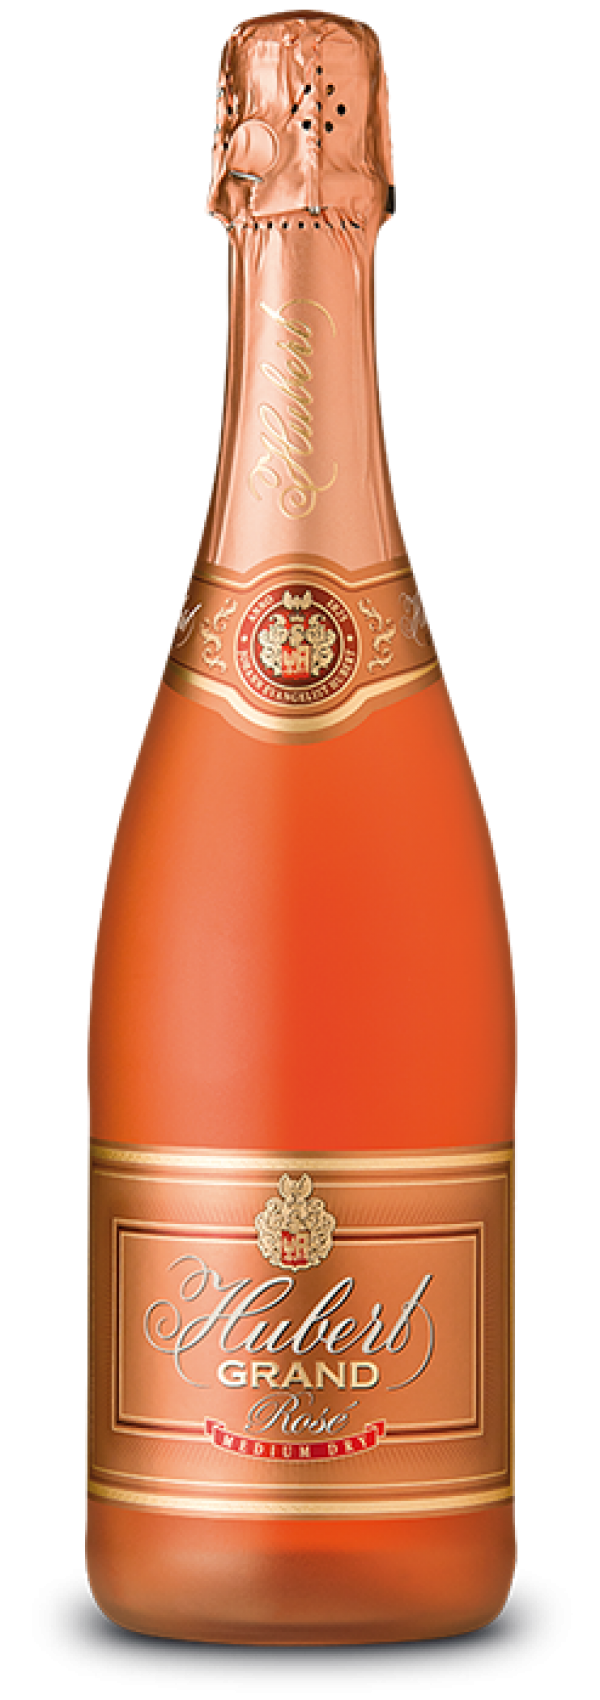 Hubert Grand Rosé